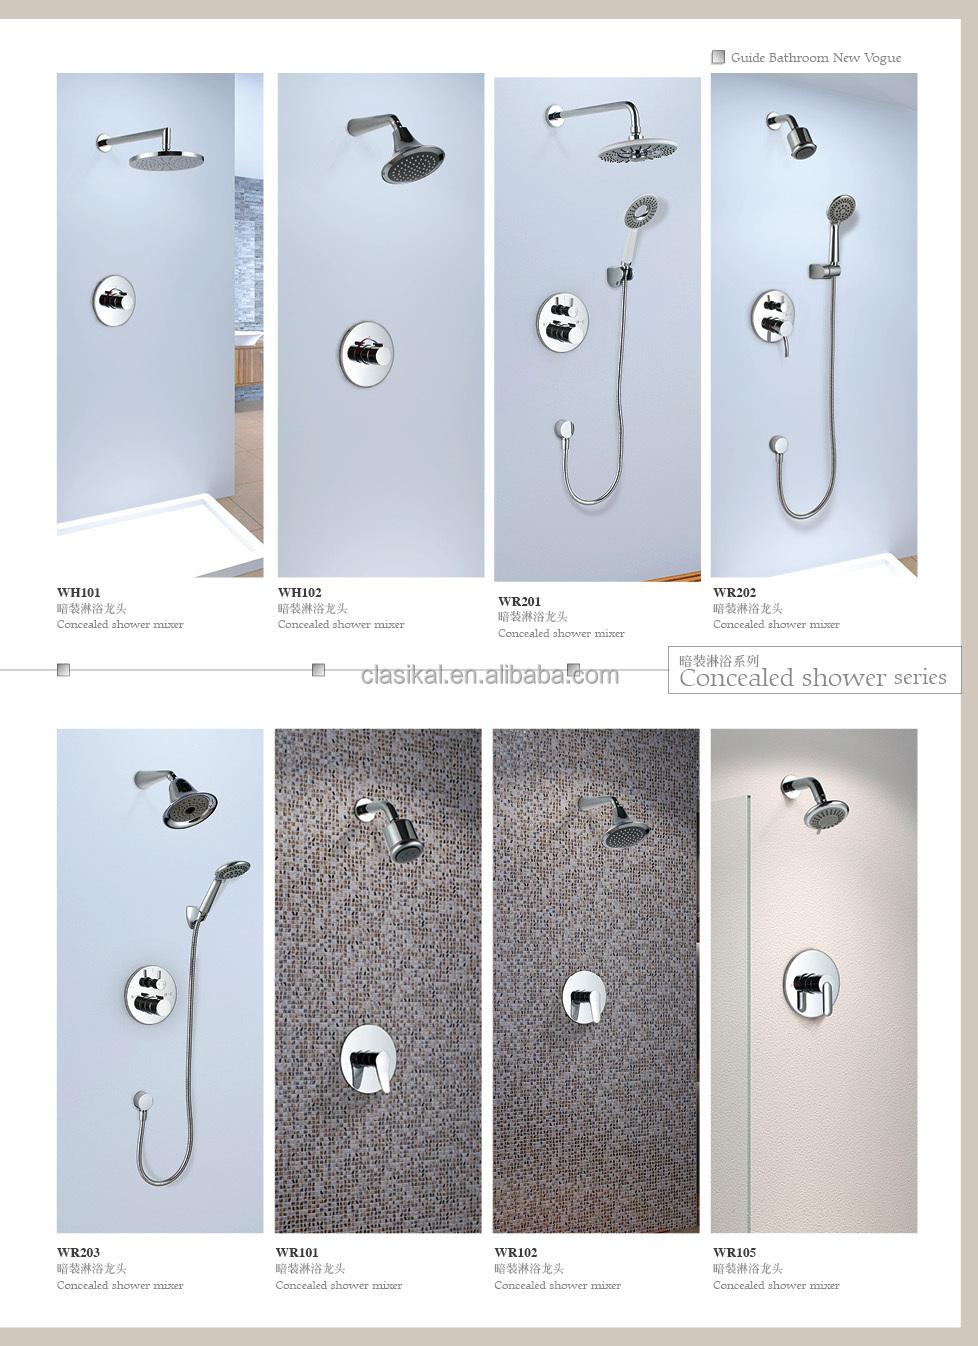 hidden shower tube JizzBunker voyeur, shower, hidden, hidden cam in room,  1  year ago 02:00 VoyeurHit shower, voyeur in pool, hidden camera shower.